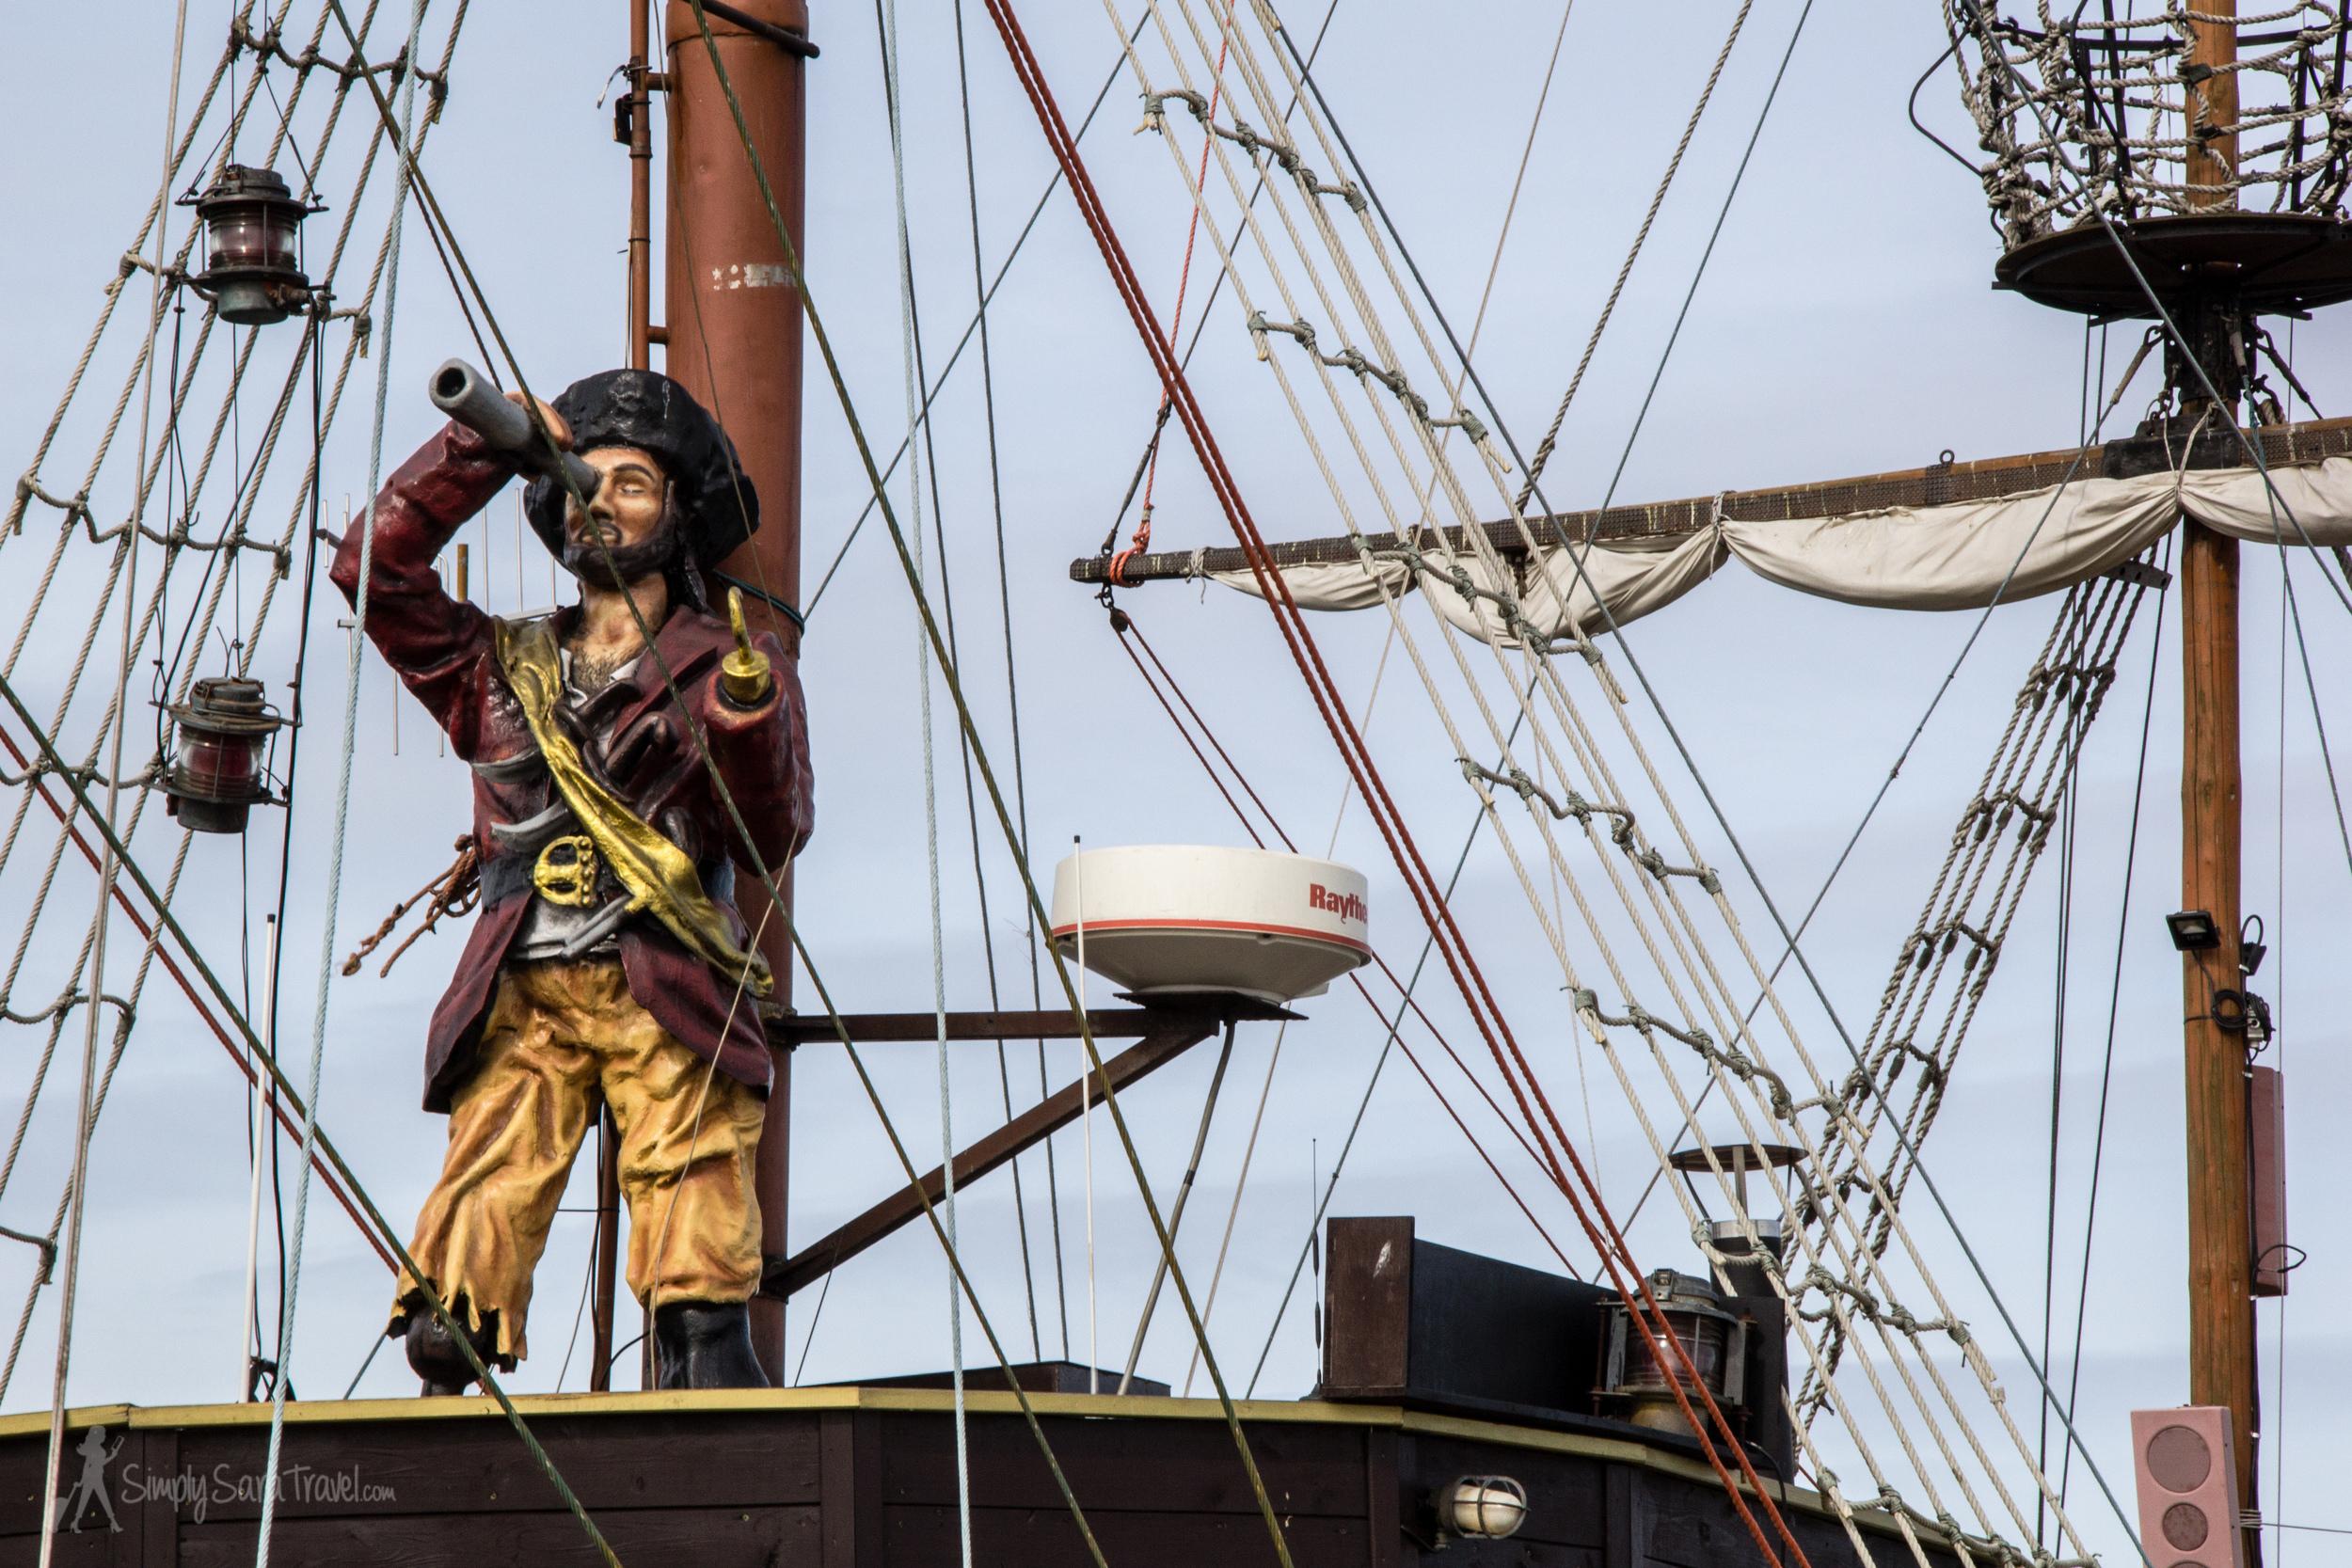 Pirate ship in Sopot, Poland